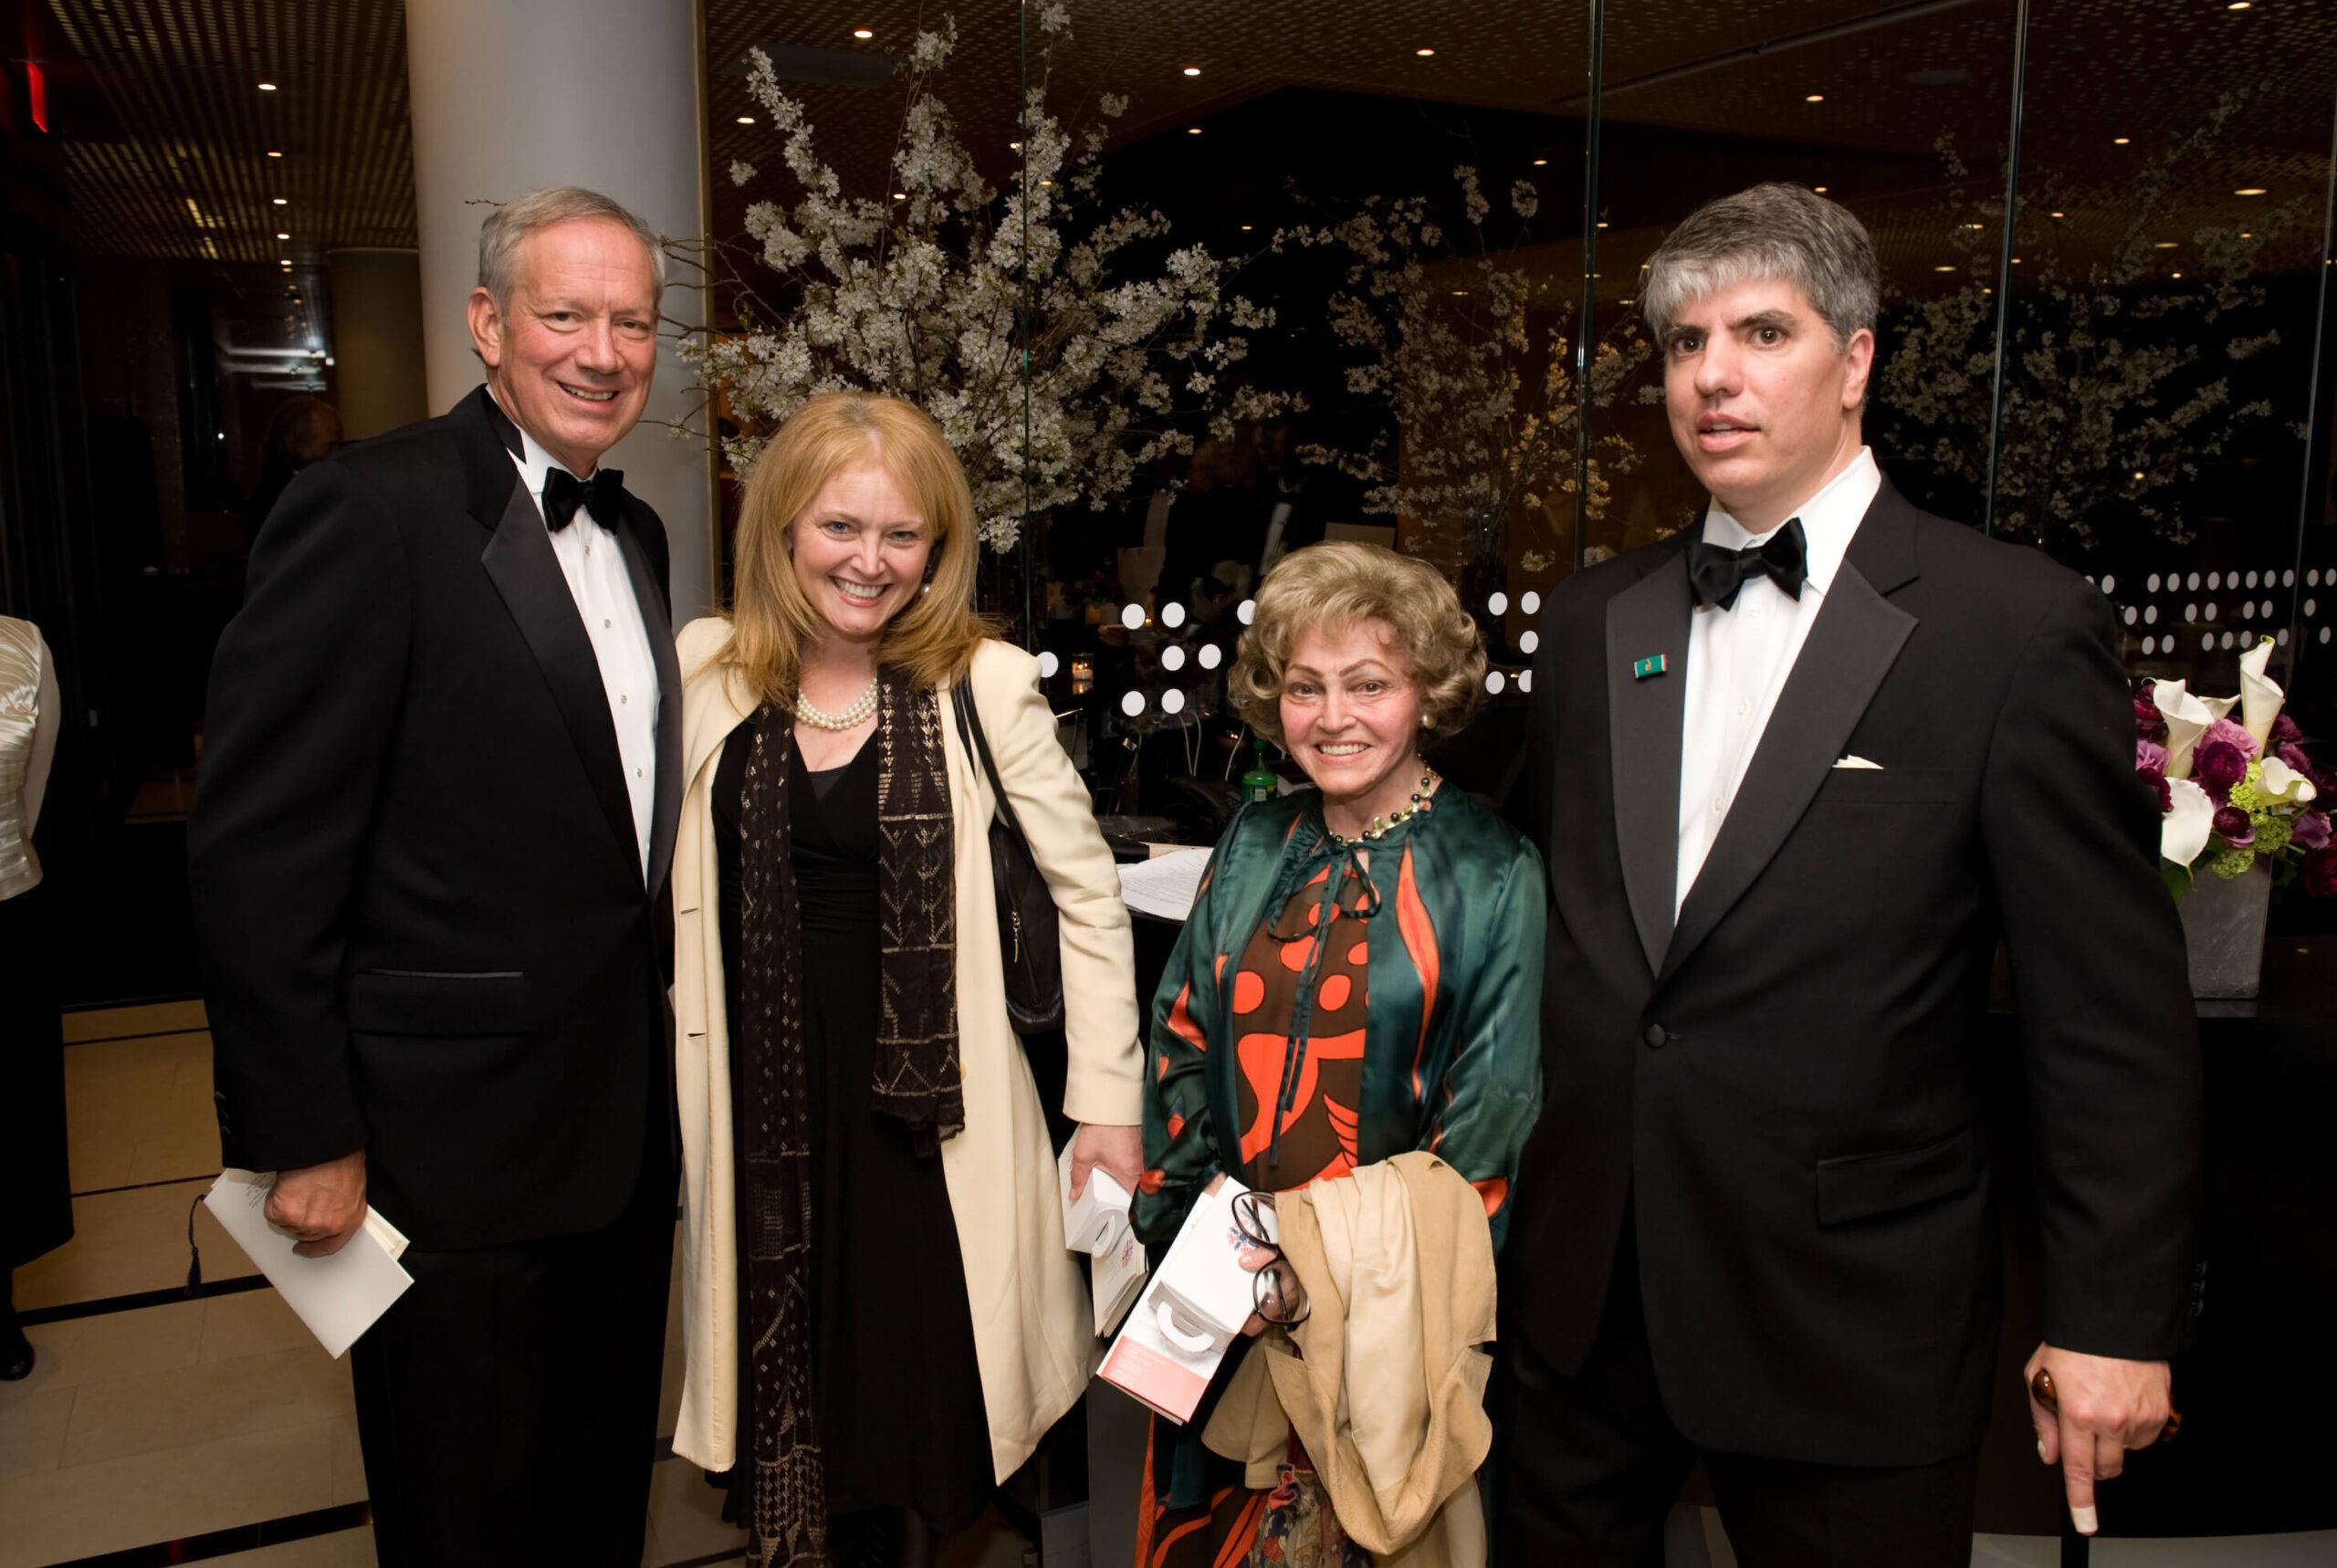 Governor George Pataki, Mrs. Katrina Lantos-Swett, Mrs. Anette Lantos, Mr. Maximilian N. Teleki